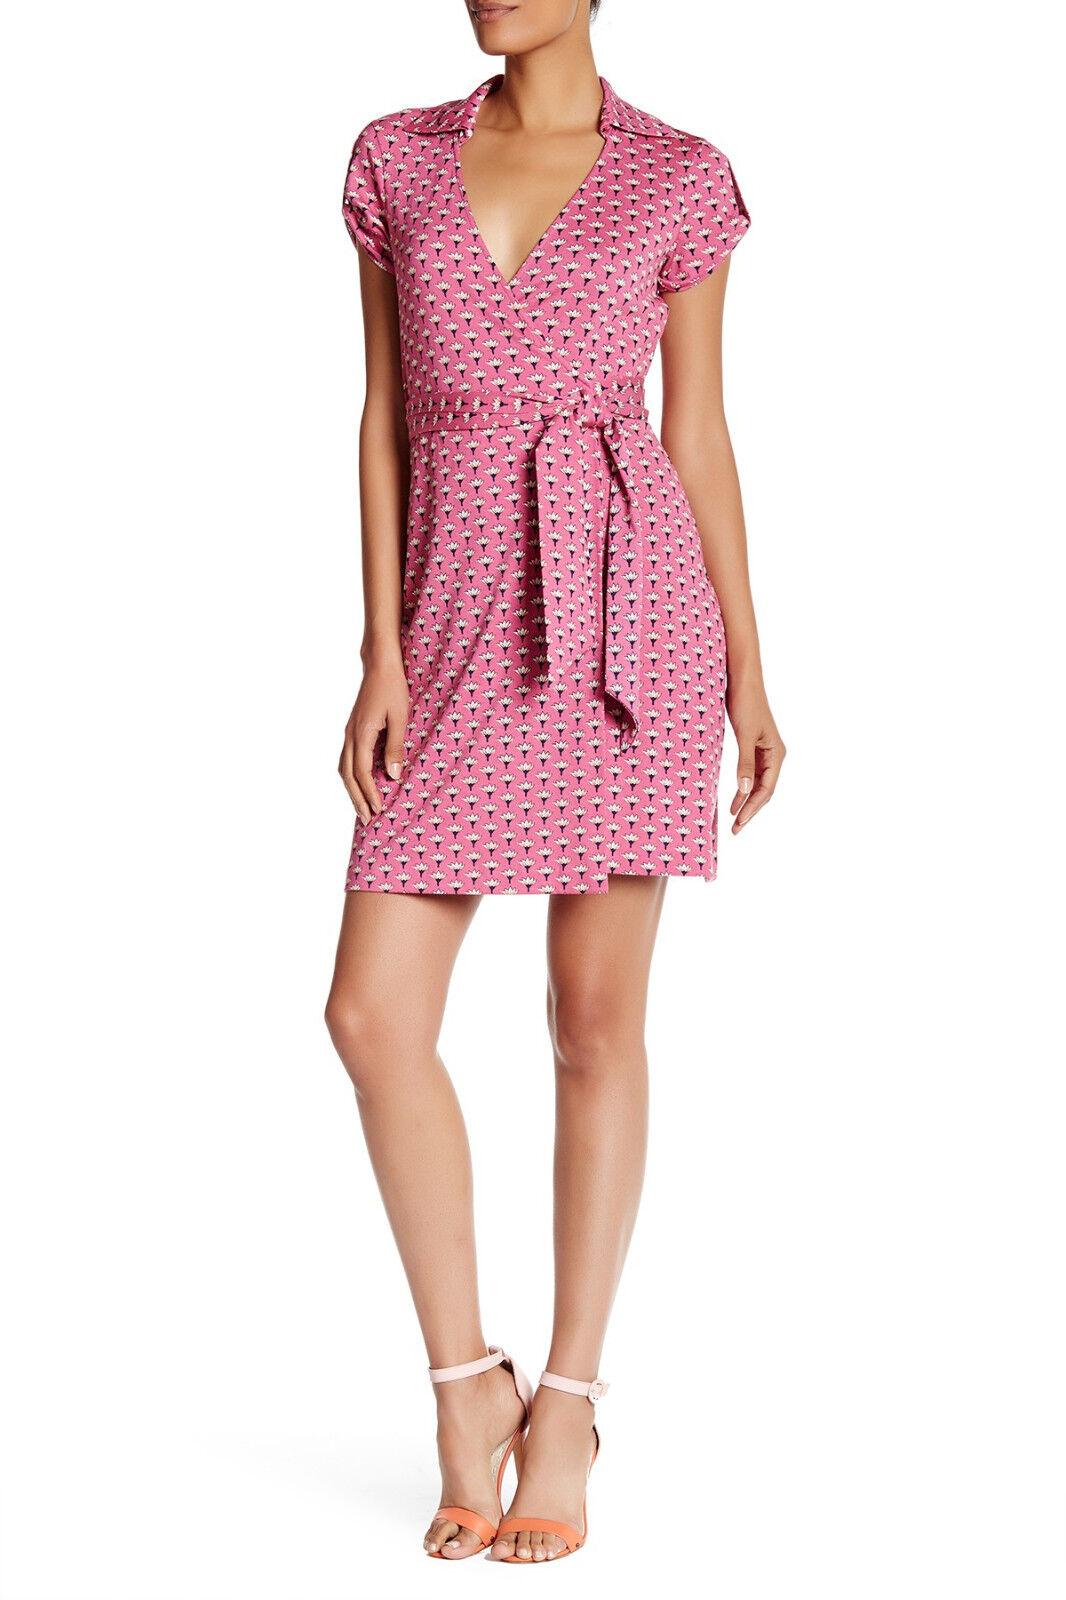 SZ 14 Diane Diane Diane von Furstenberg DVF Jilda Two Peace Palm Pink Collar Wrap Dress NWT c1da9c